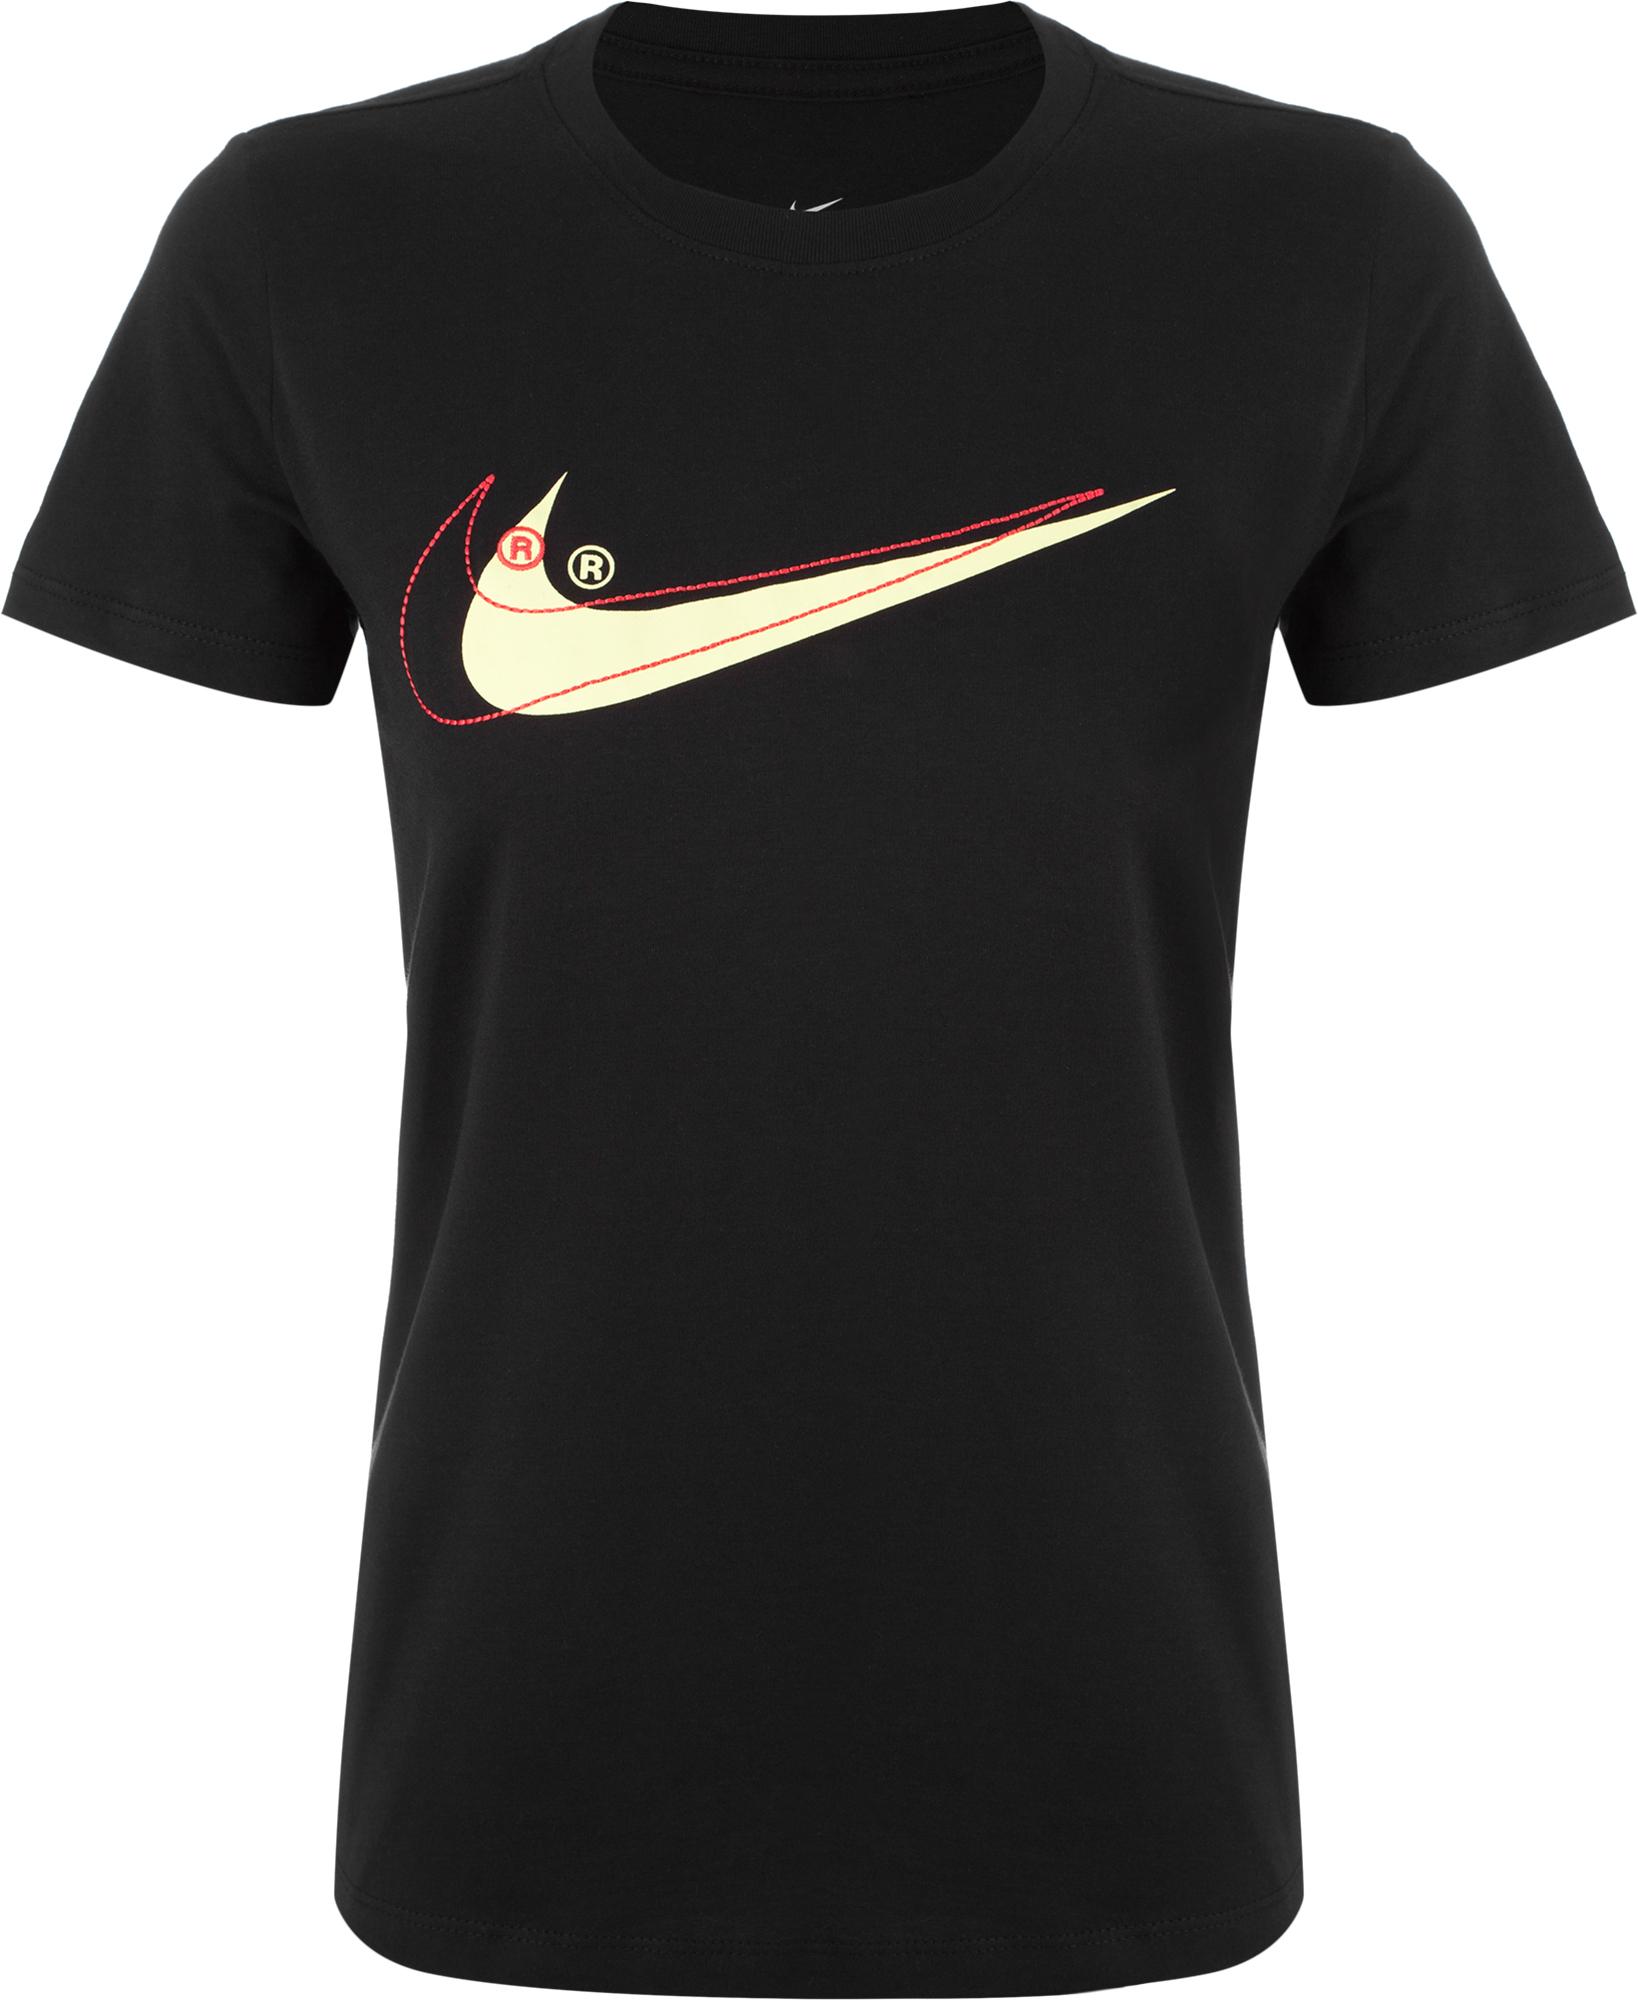 Nike Футболка женская Nike Sportswear, размер 48-50 nike бриджи женские nike sportswear vintage размер 48 50